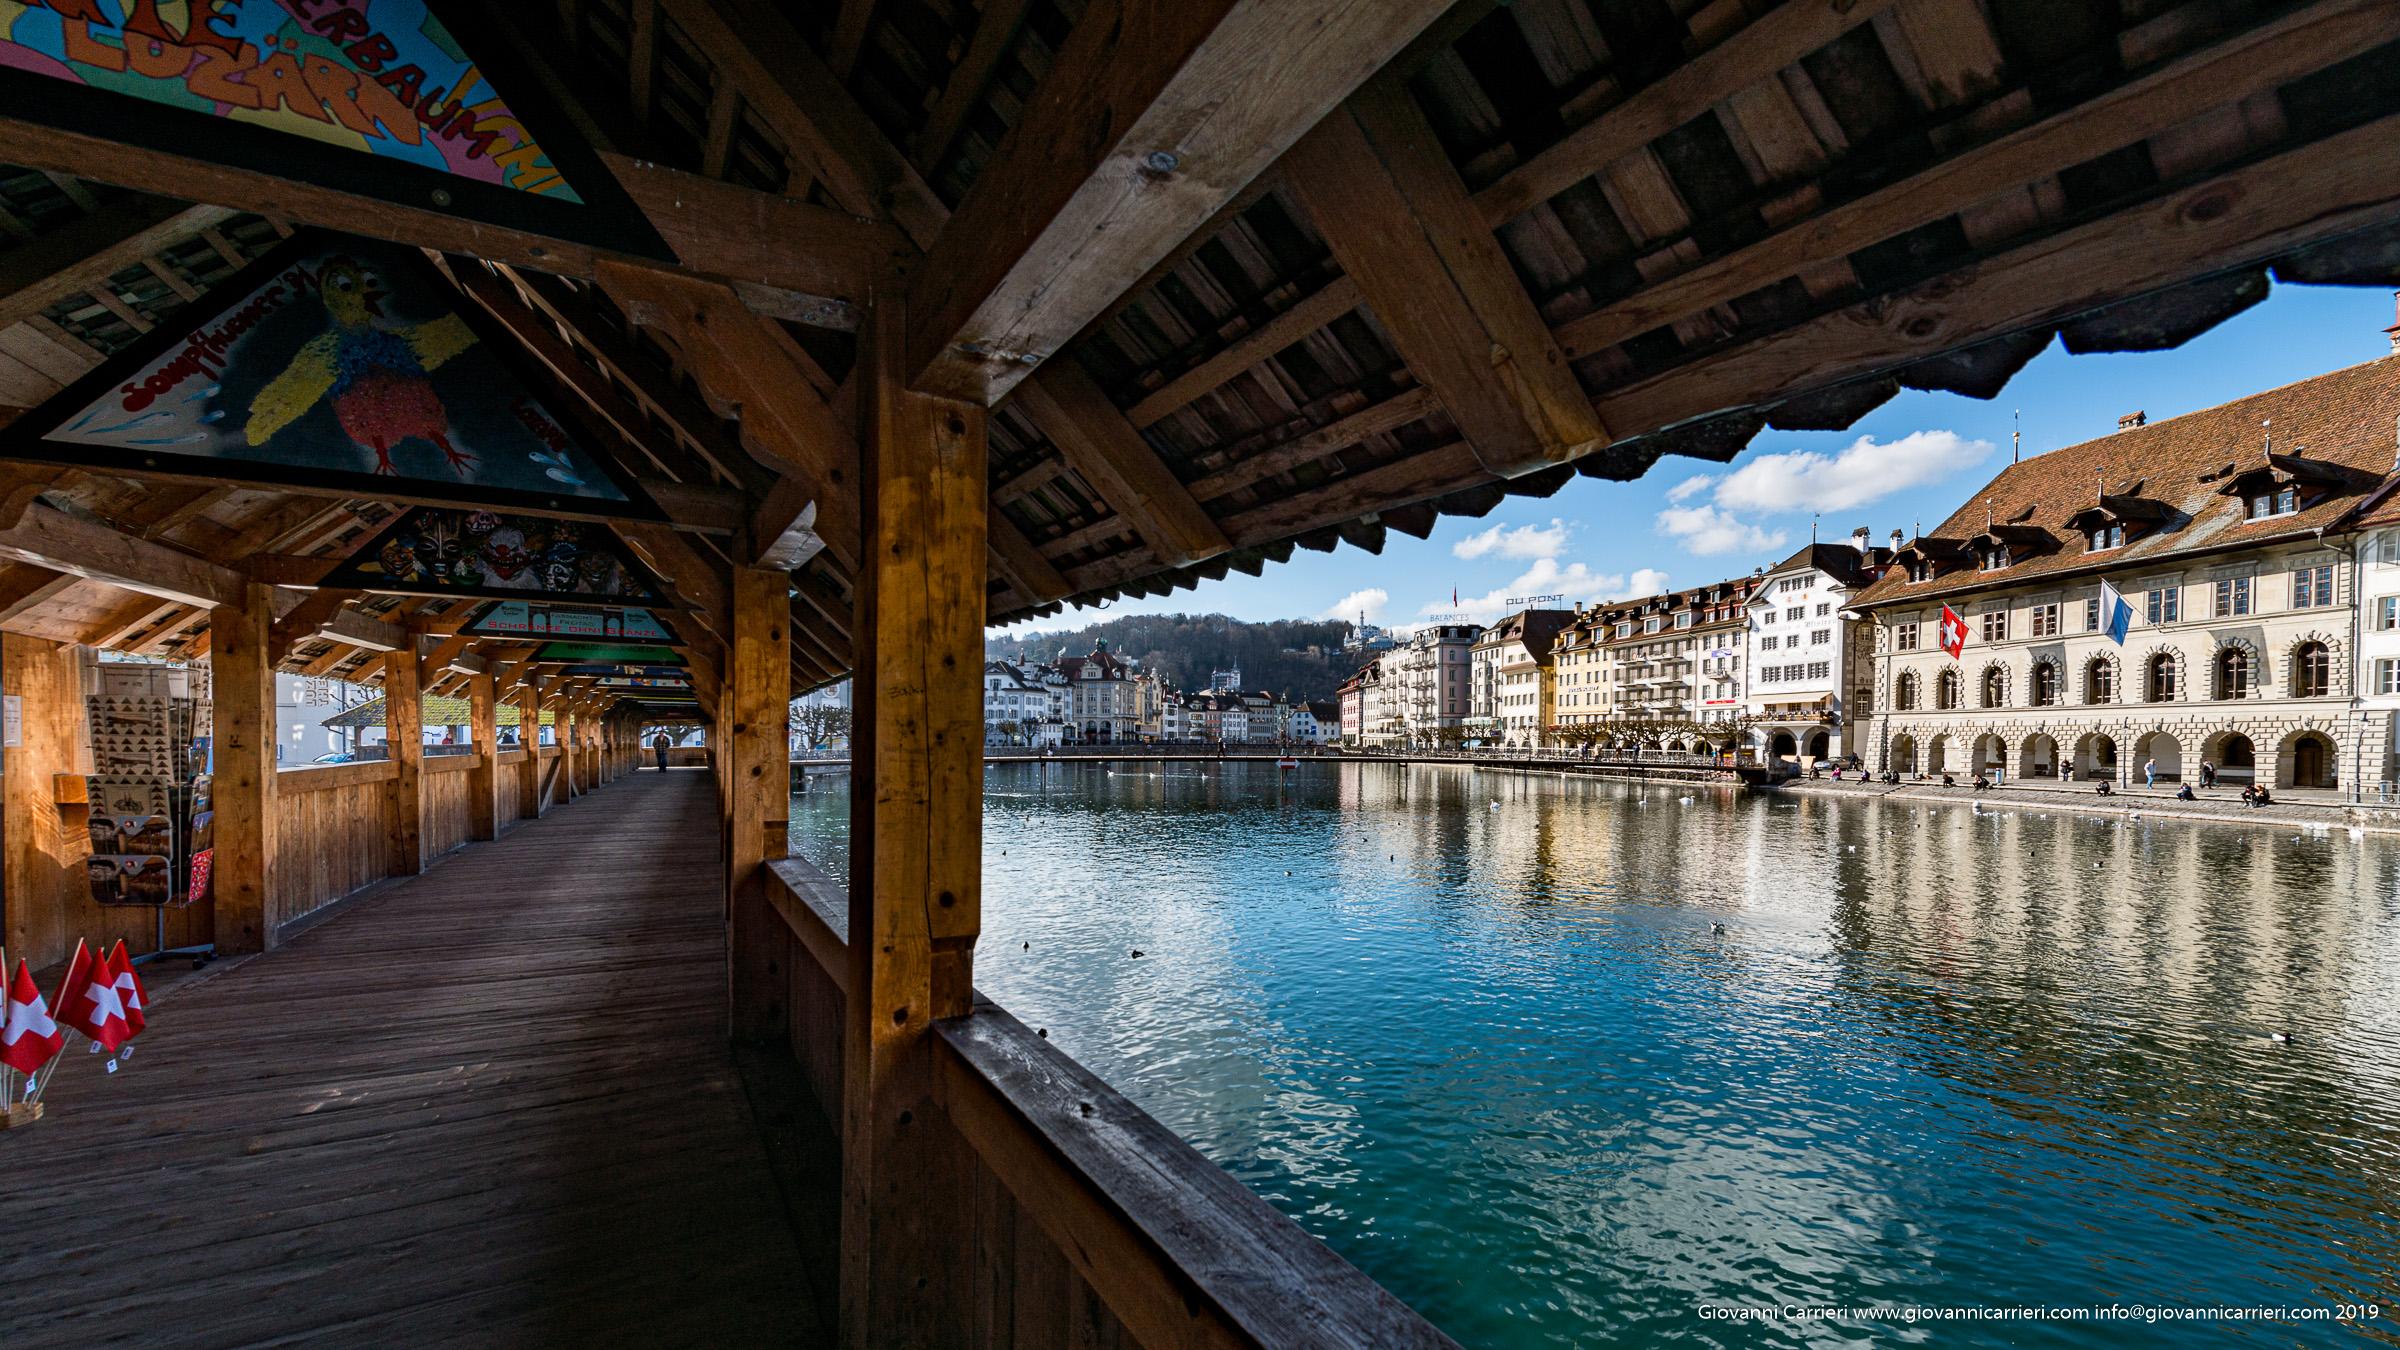 Vista dall'interno del ponte Kapellbrücke di Lucerna e del fiume Reuss